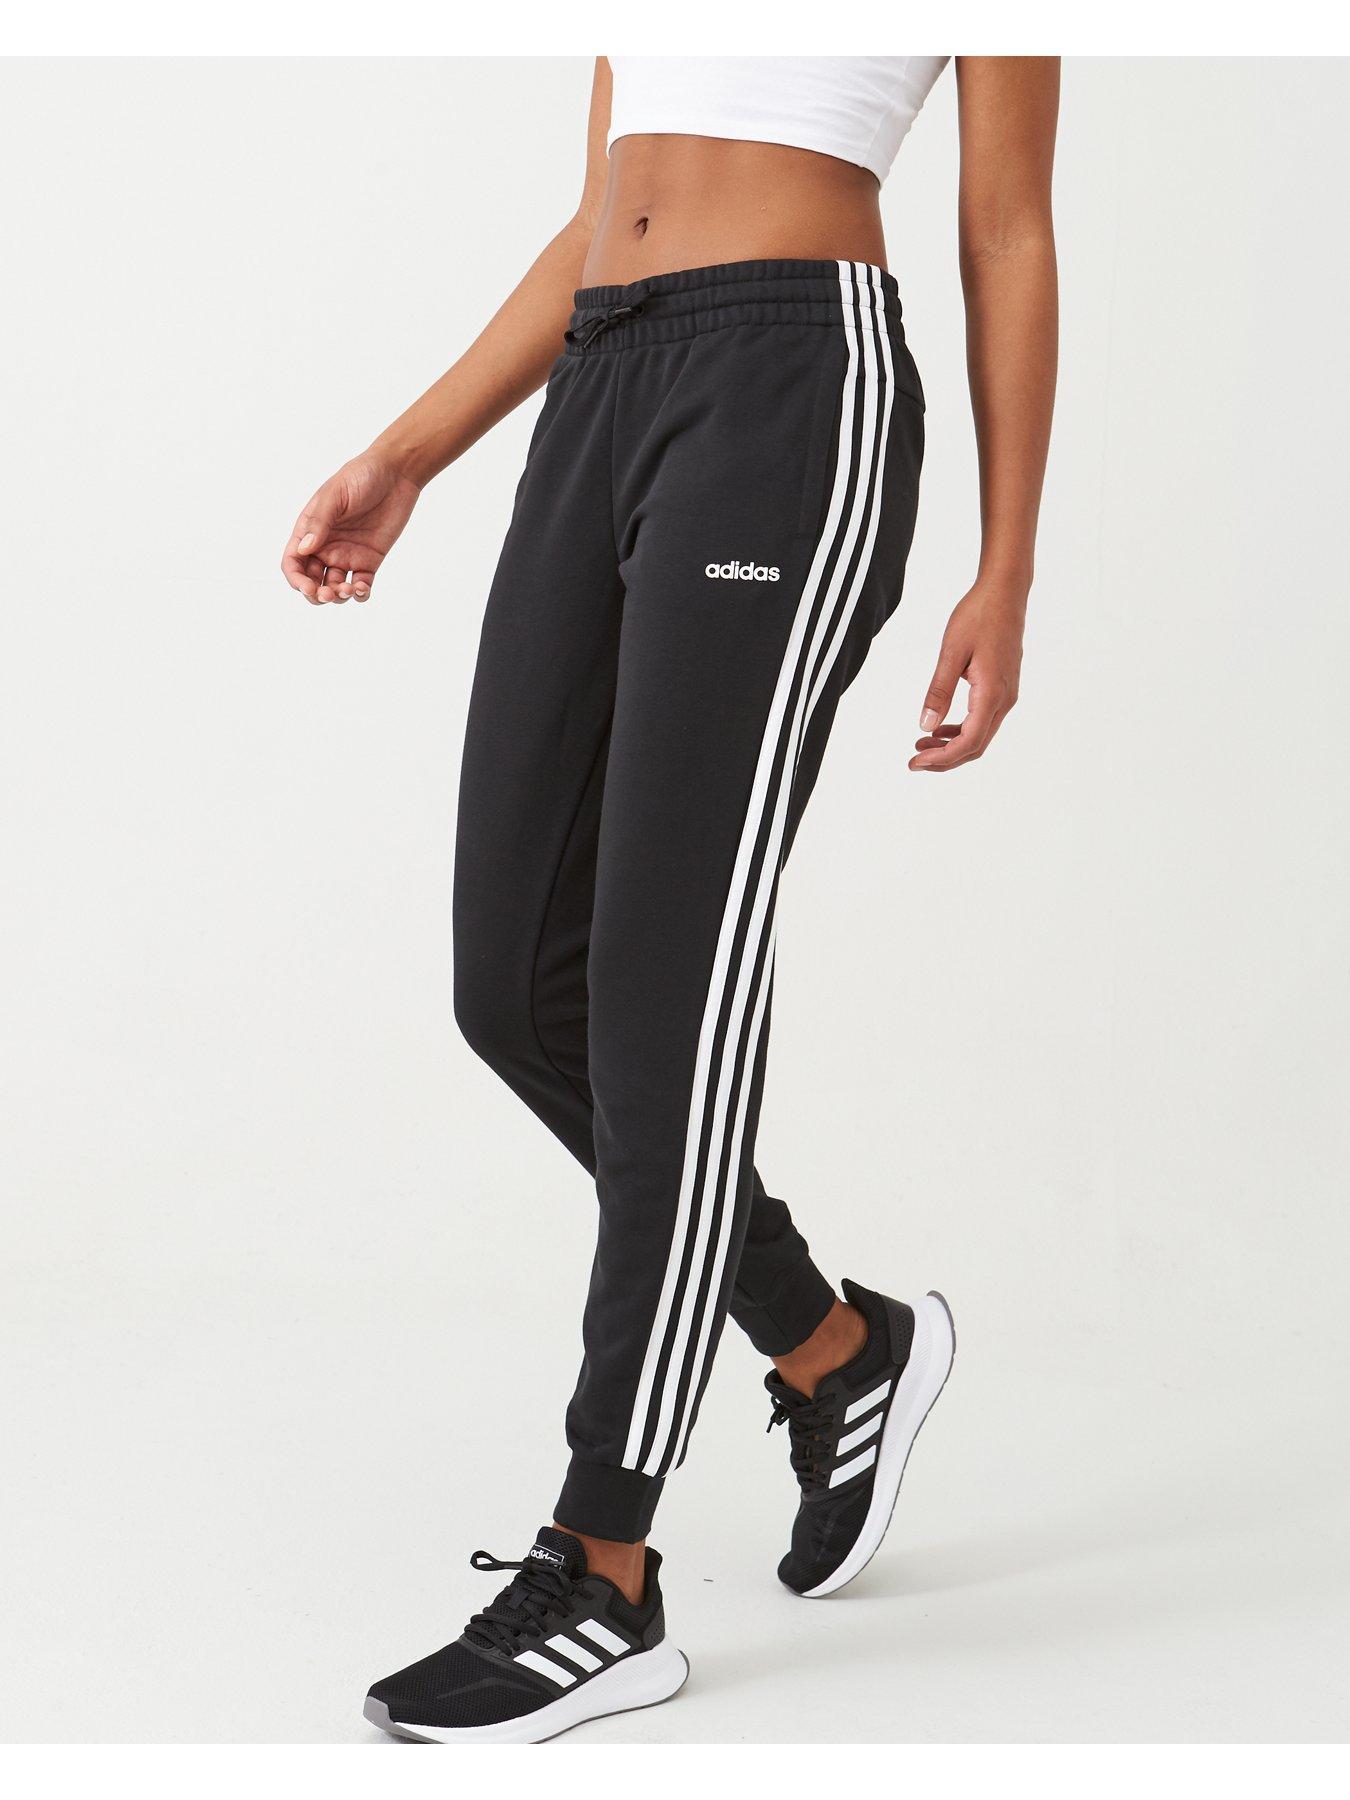 adidas jogging bottoms womens